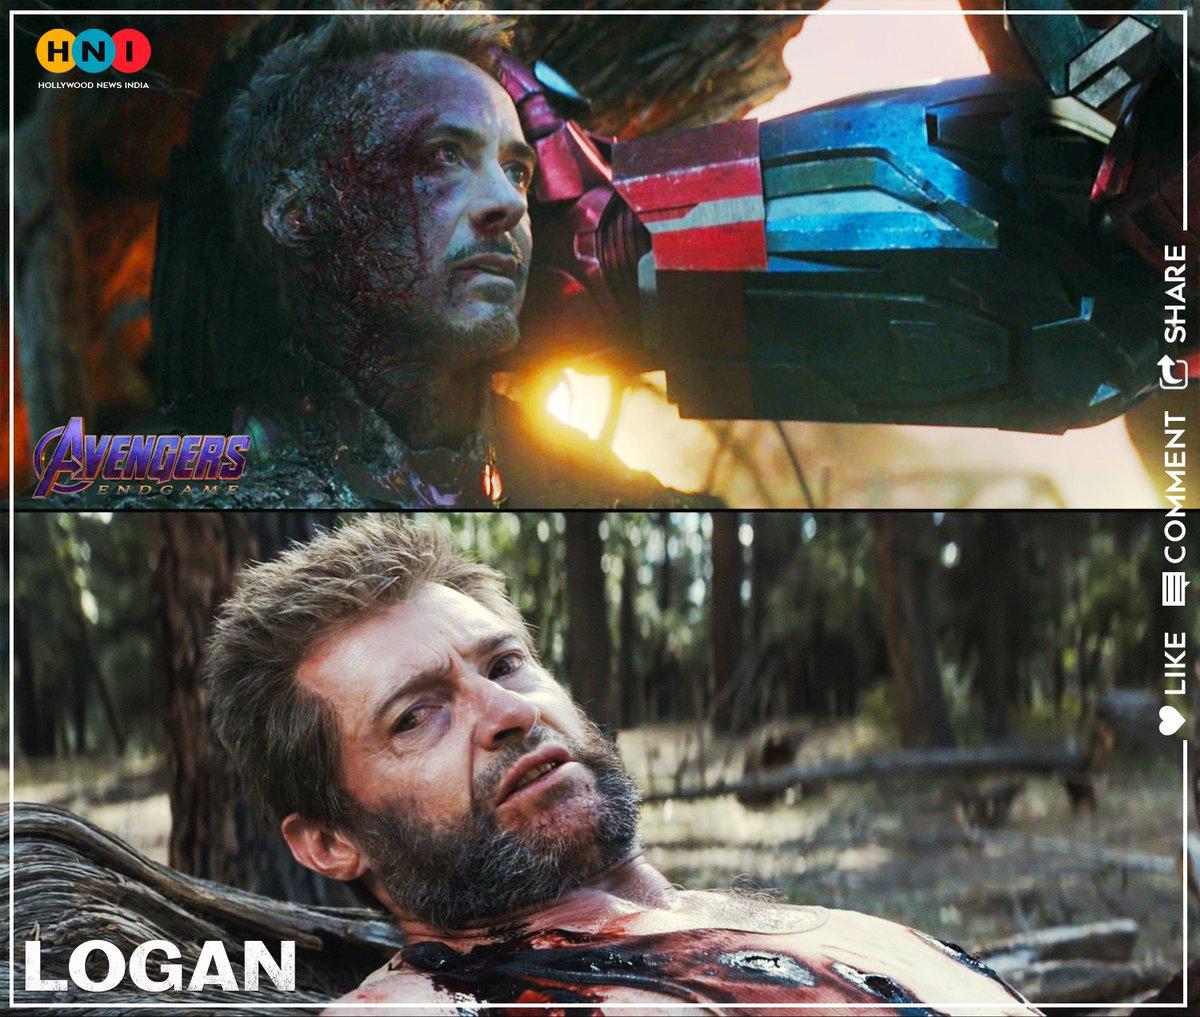 Whose Death Made You Cry ? Ironman or Logan   #AvengersEndgame #Logan<br>http://pic.twitter.com/9fiWPutqRm